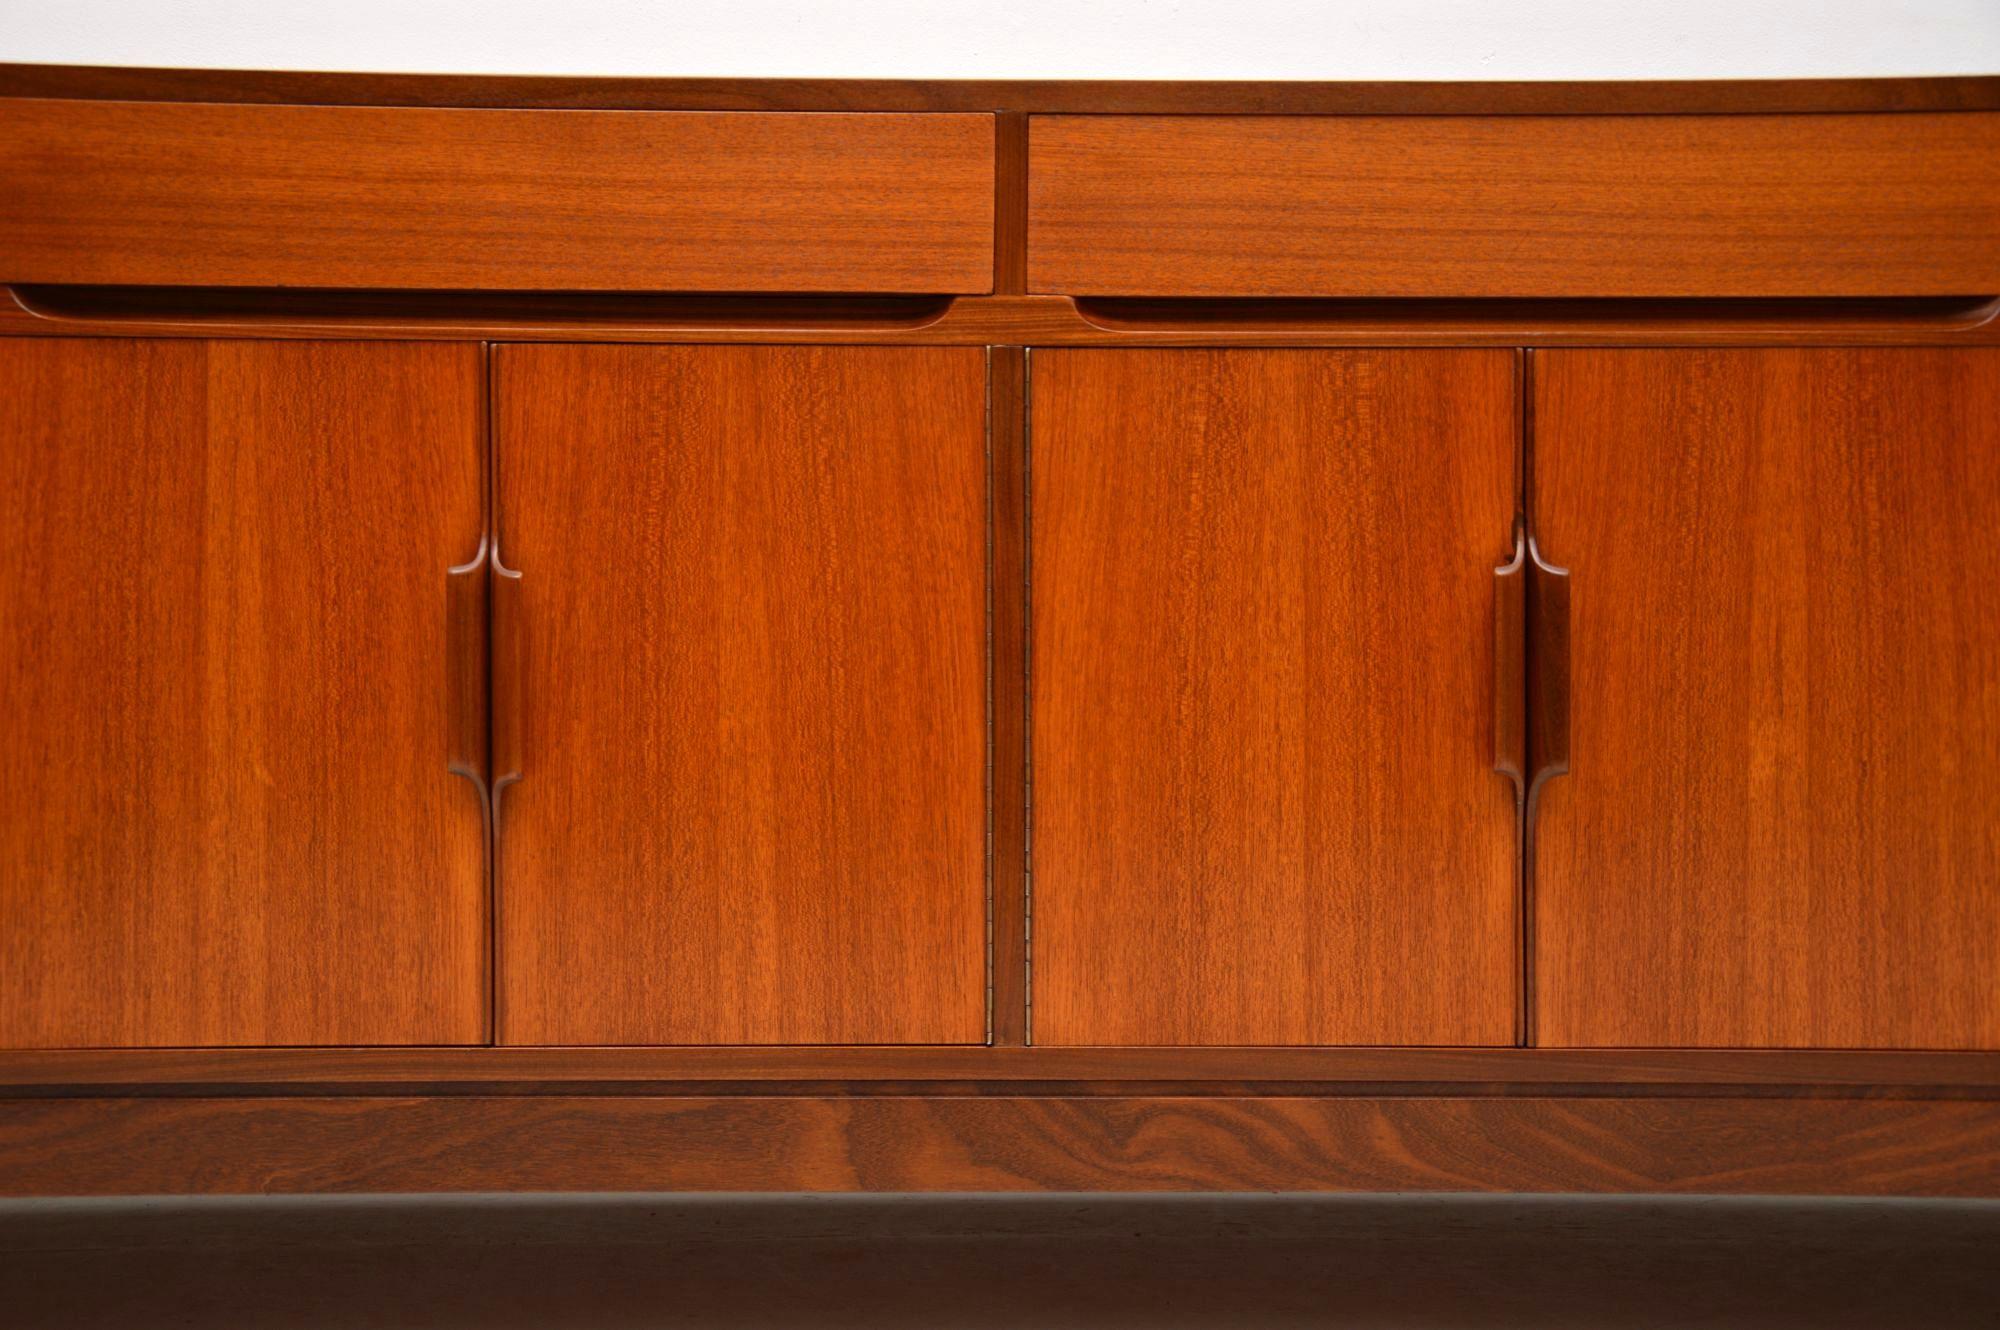 Bureau Ikea Catalogue : Phenomenal free standing desks bureau junior ikea awesome bannire